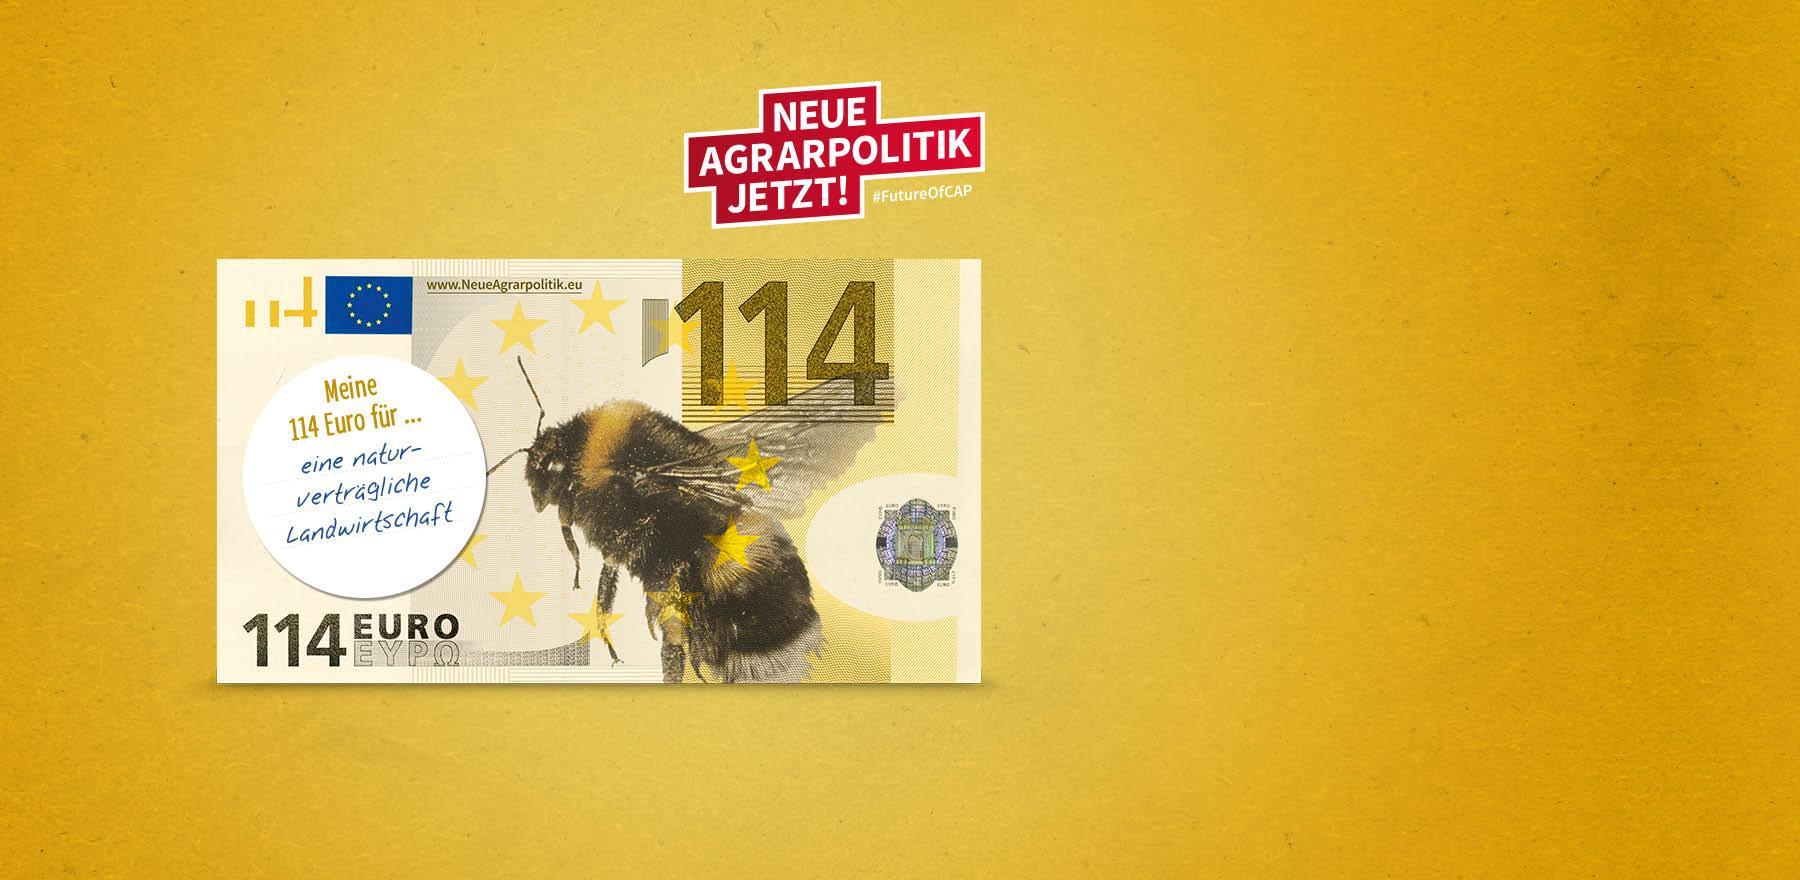 Neue Agrarpolitik jetzt!